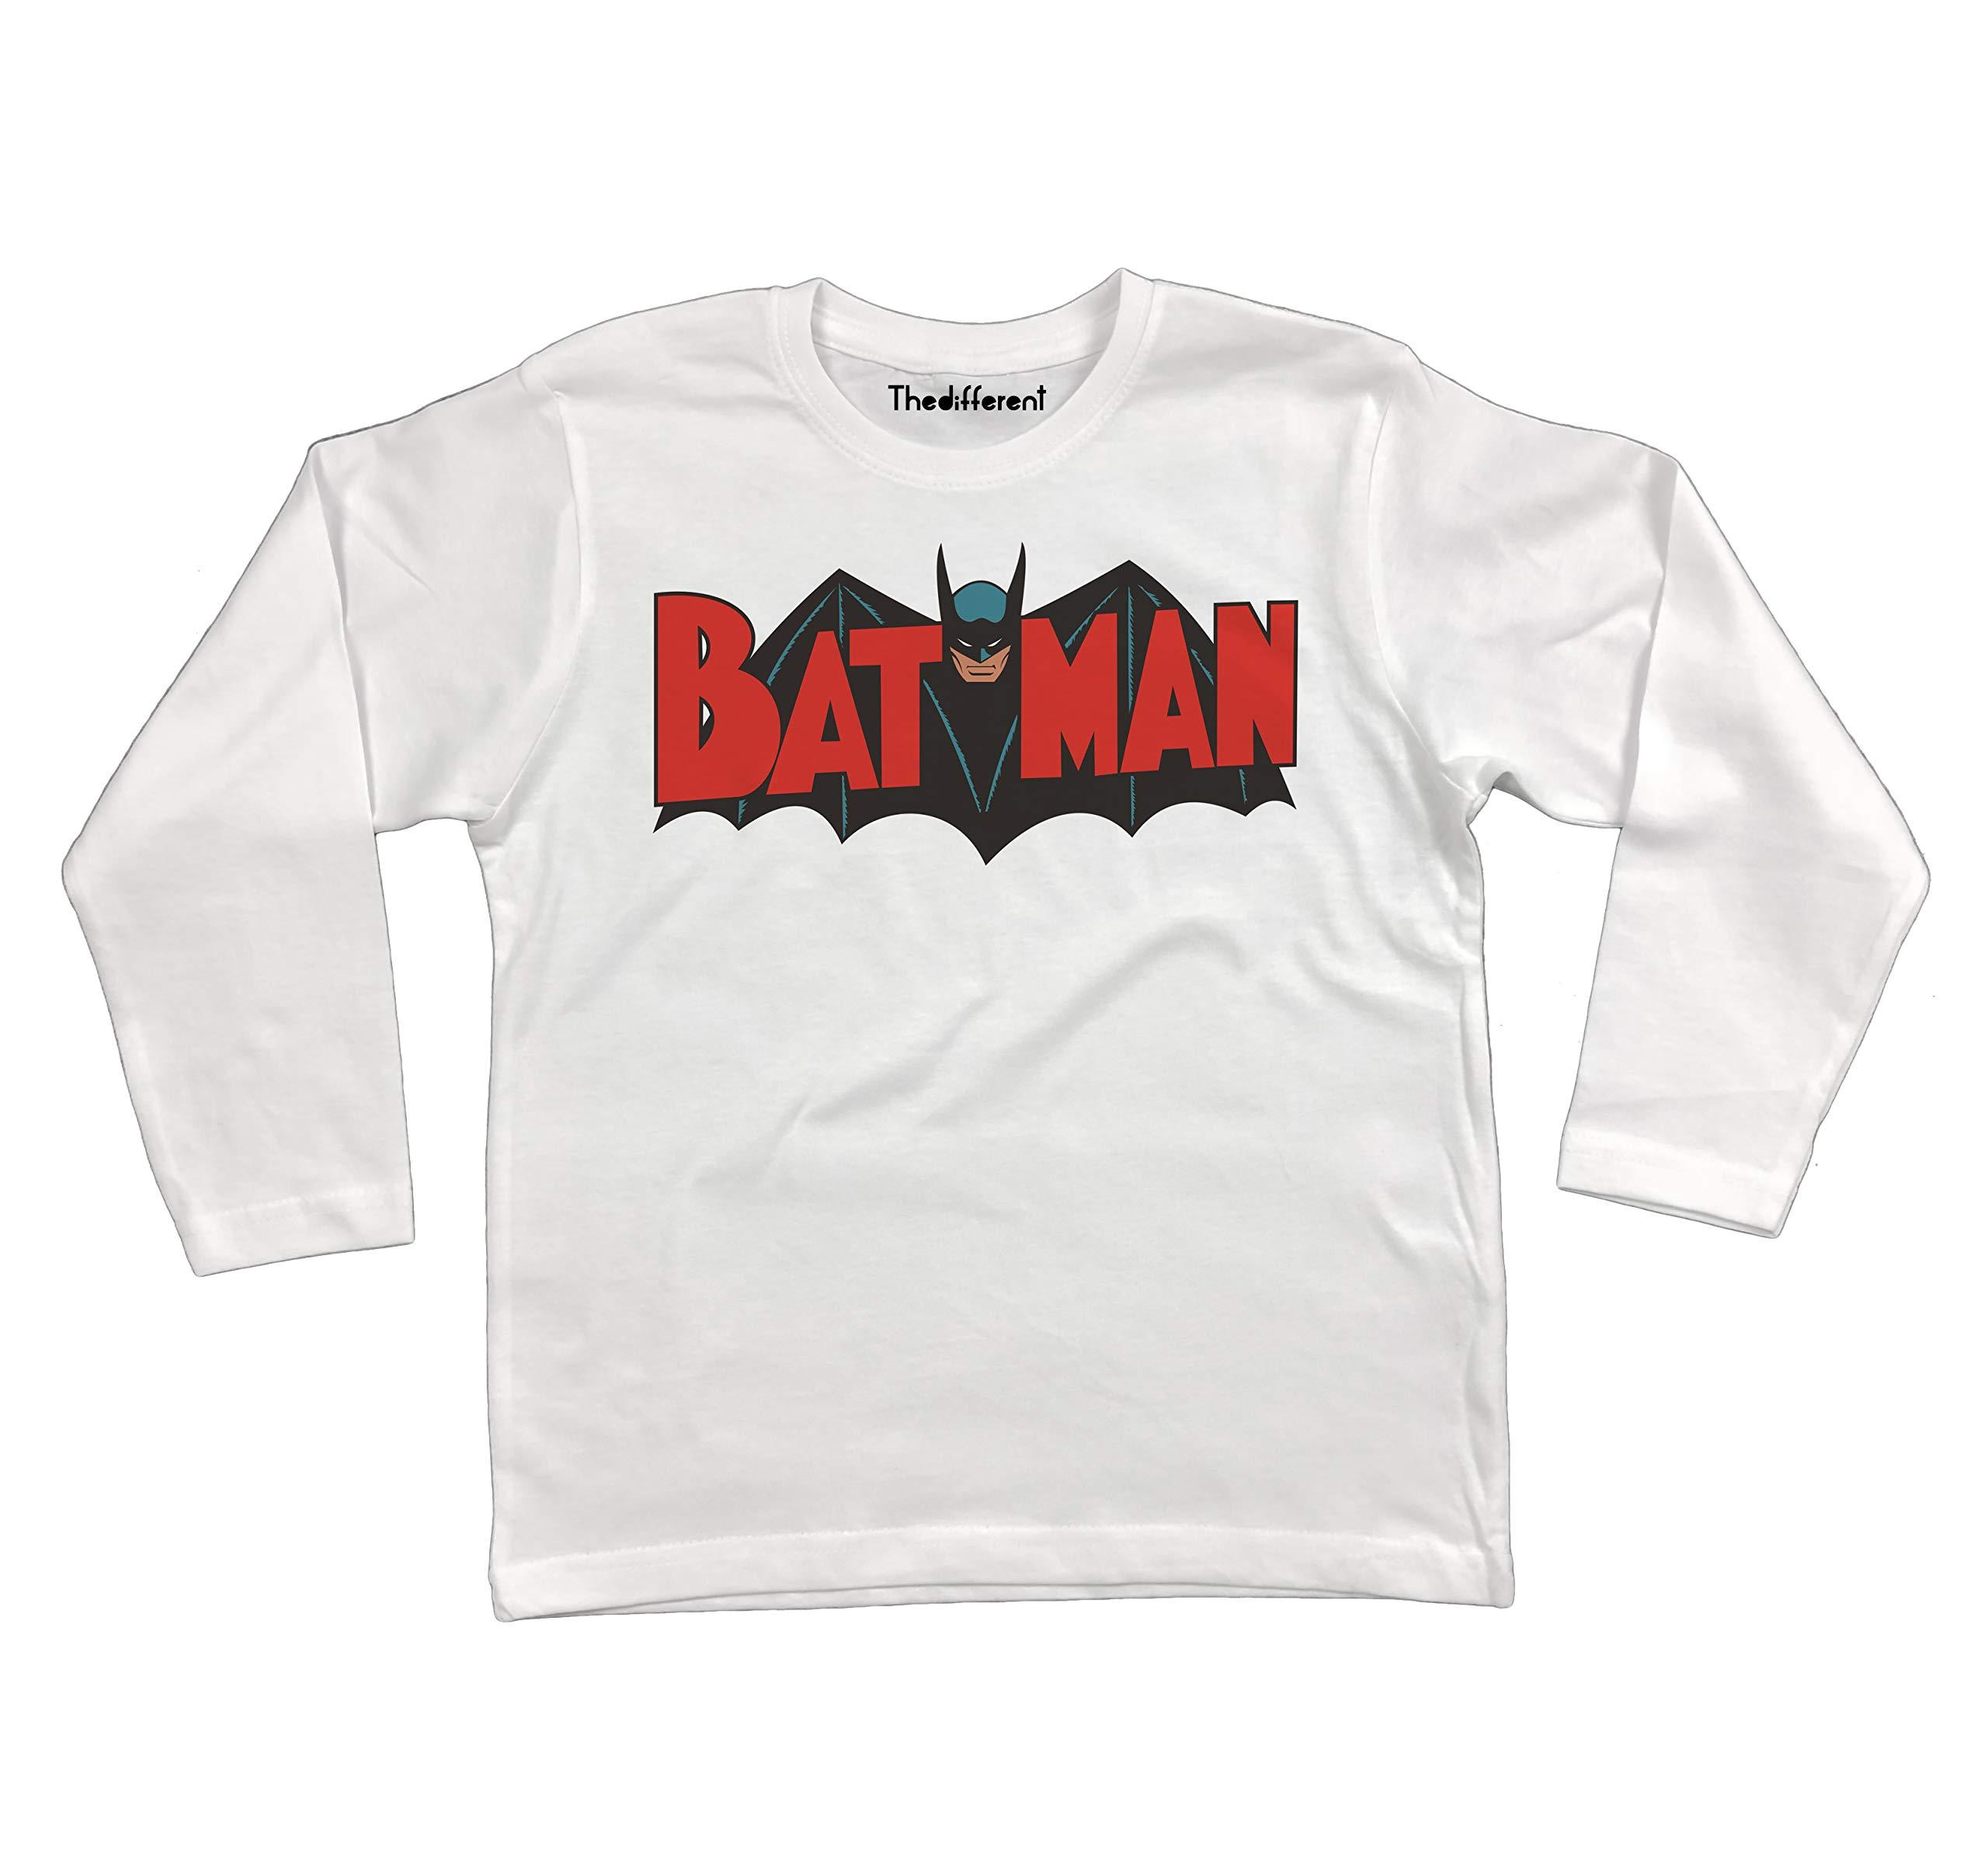 Bianco T-Shirt Manica Lunga Unisex Bambino Bambina Pungiball Rocky Balboa